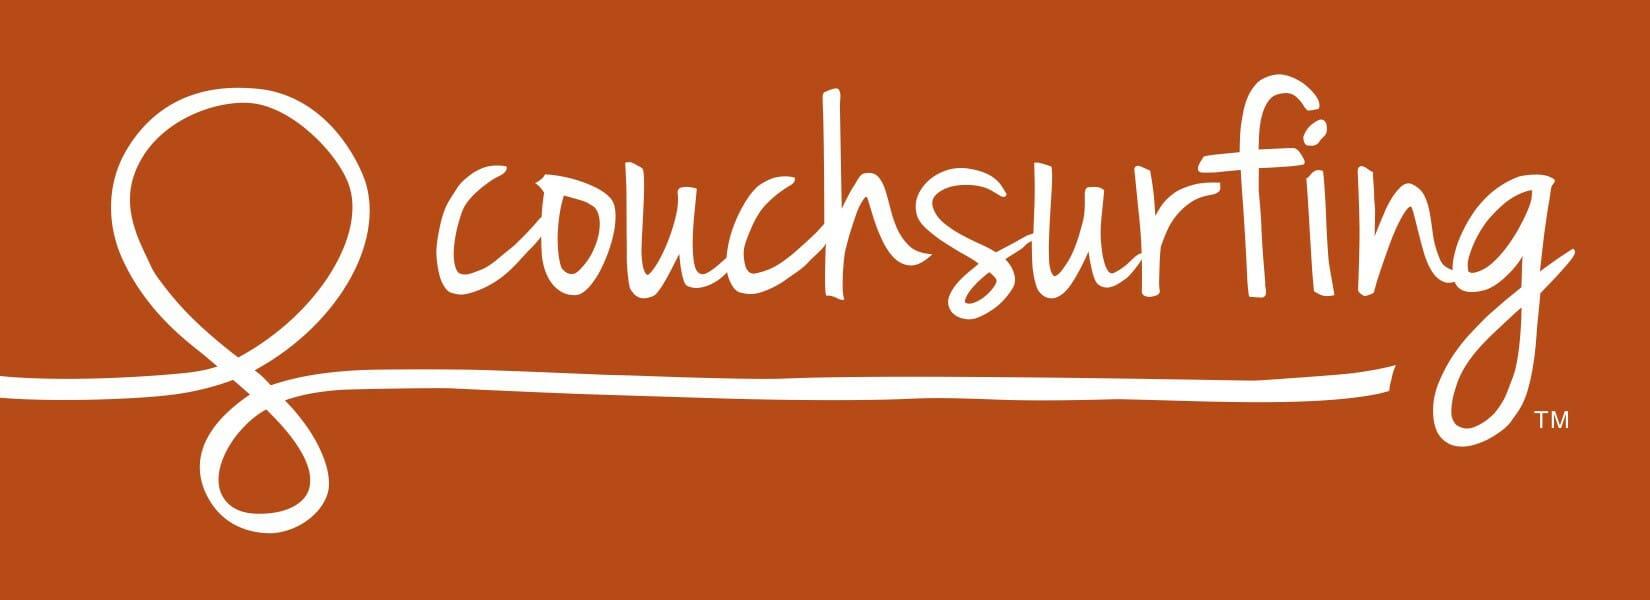 partir en nouvelle zelande couchsurfing